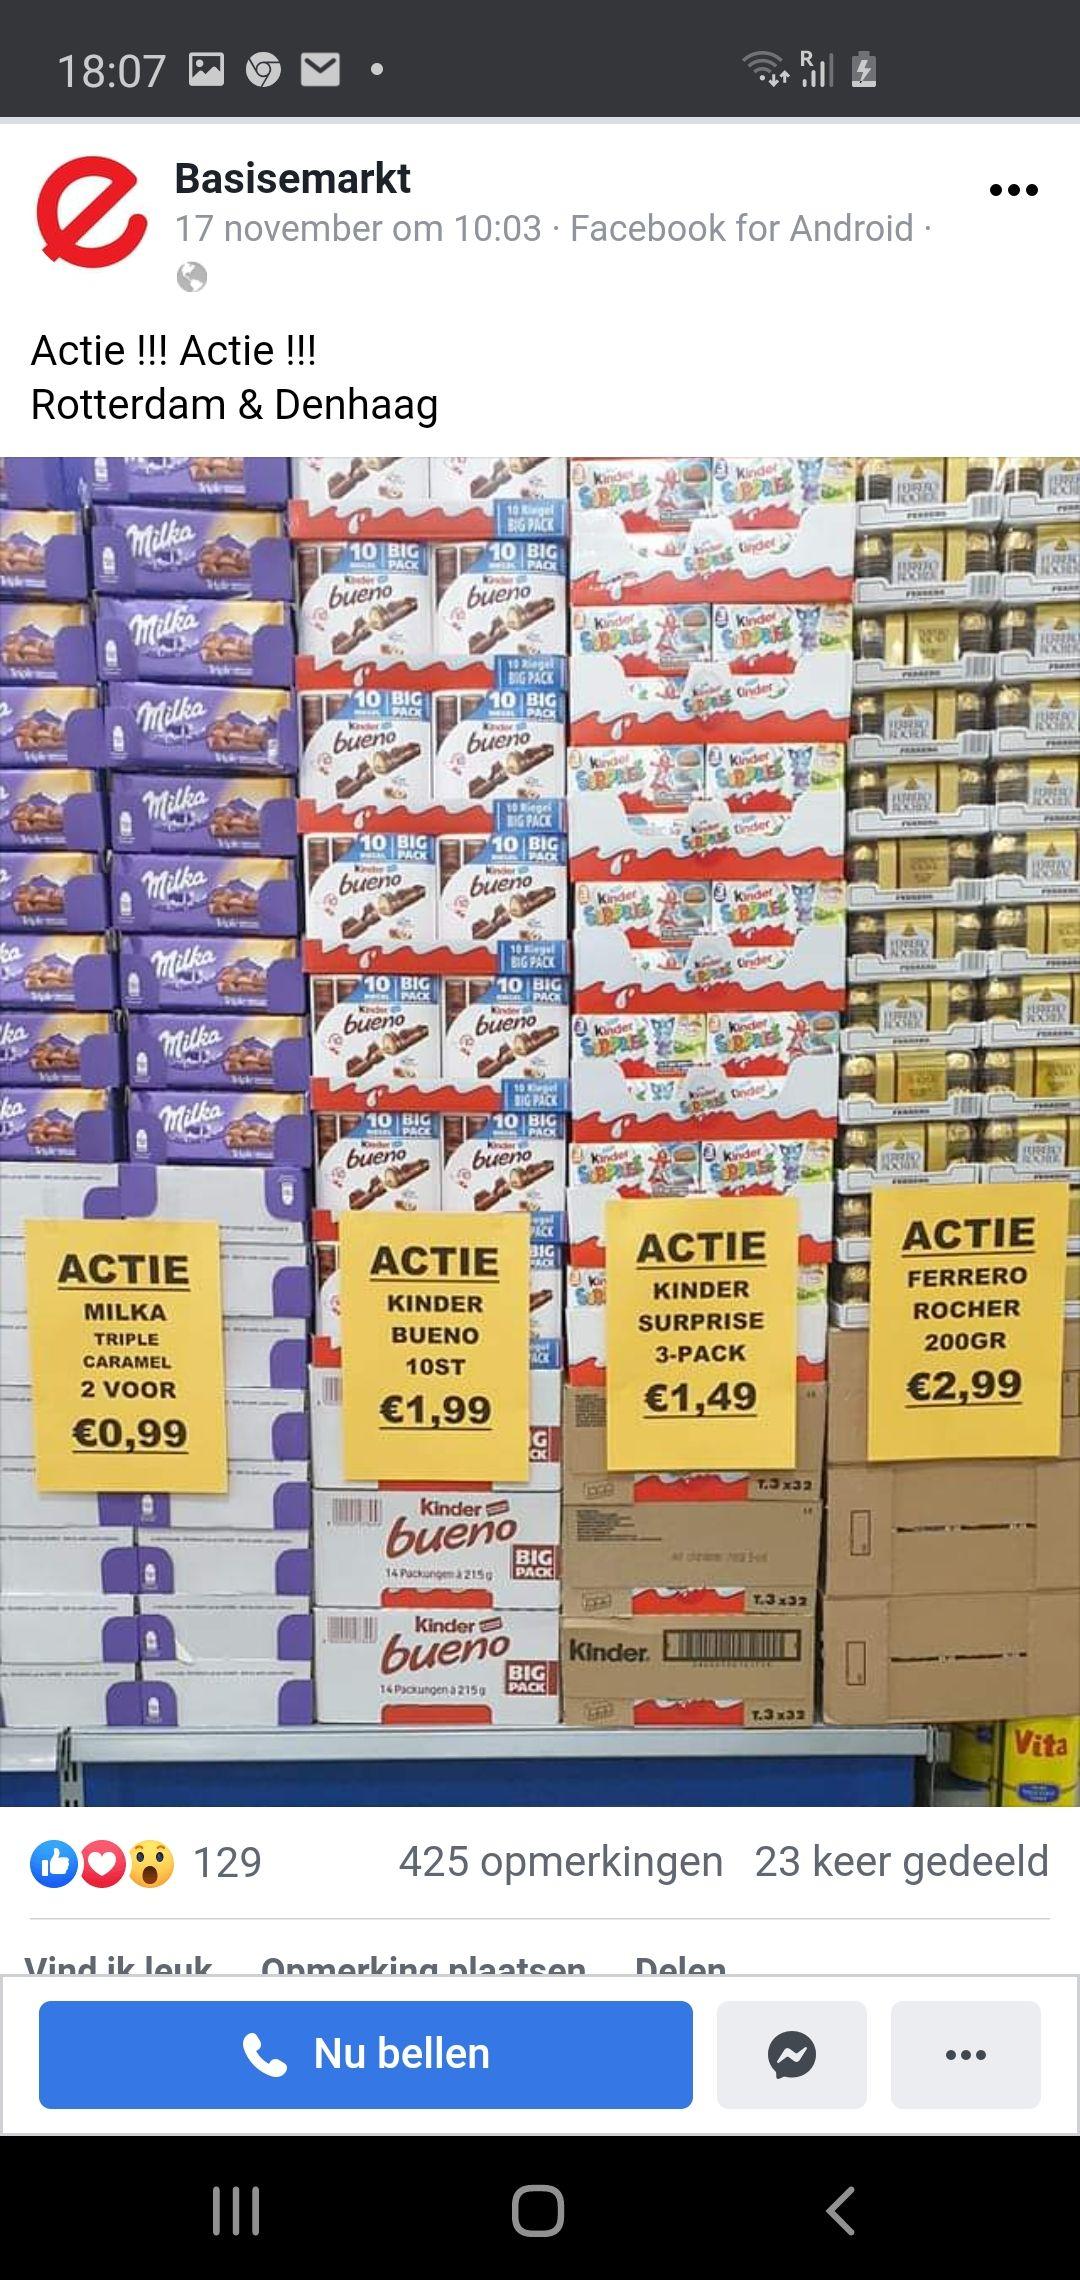 [Lokaal Den Haag/Rotterdam] 10st Kinder Bueno €1.99 @ Basis E Markt